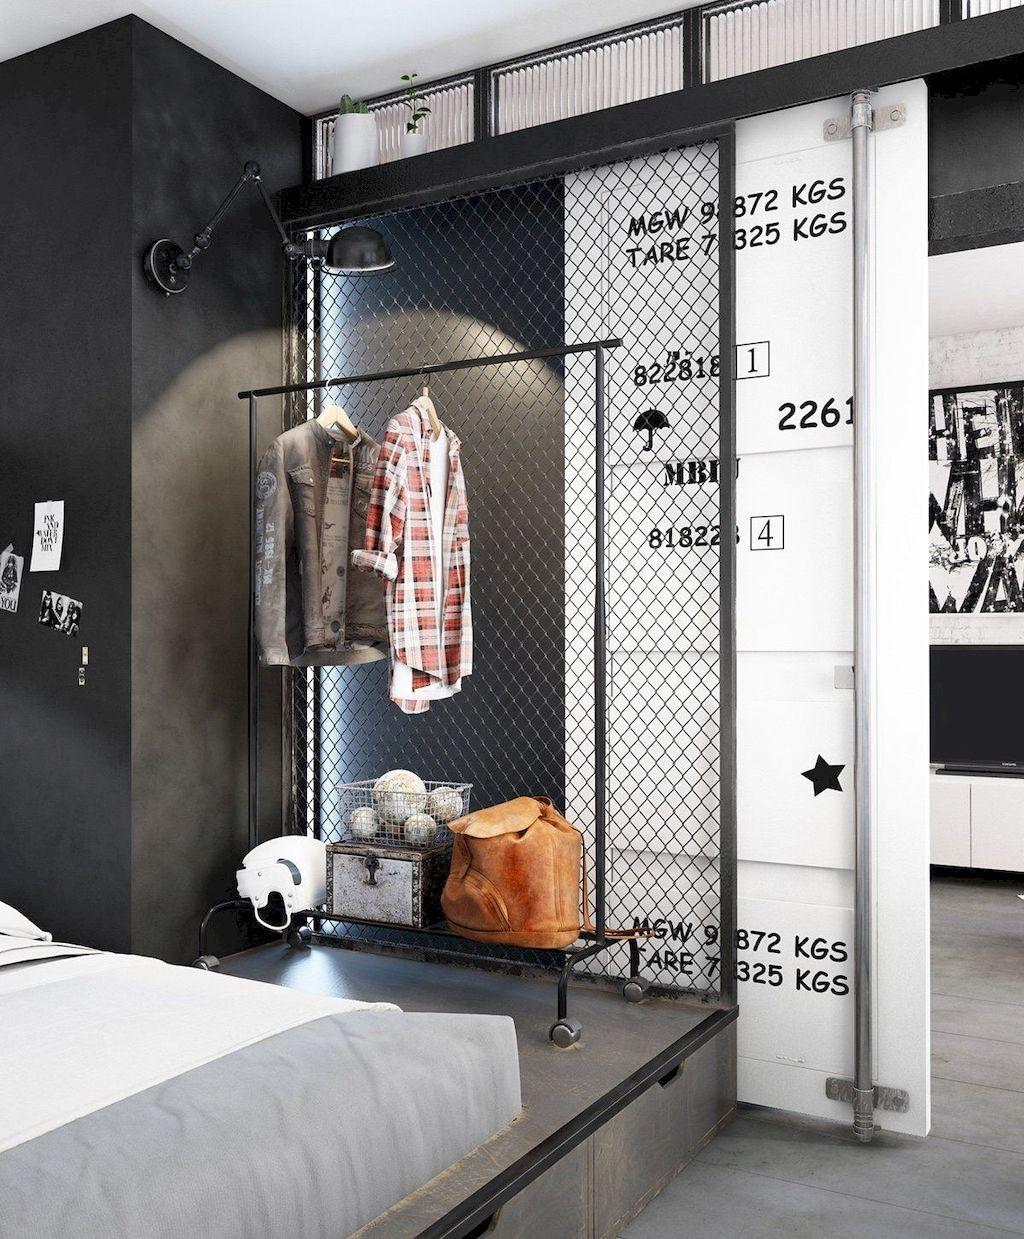 Urban loft bedroom   Tiny Apartment with Loft Space Ideas  High top tables Loft